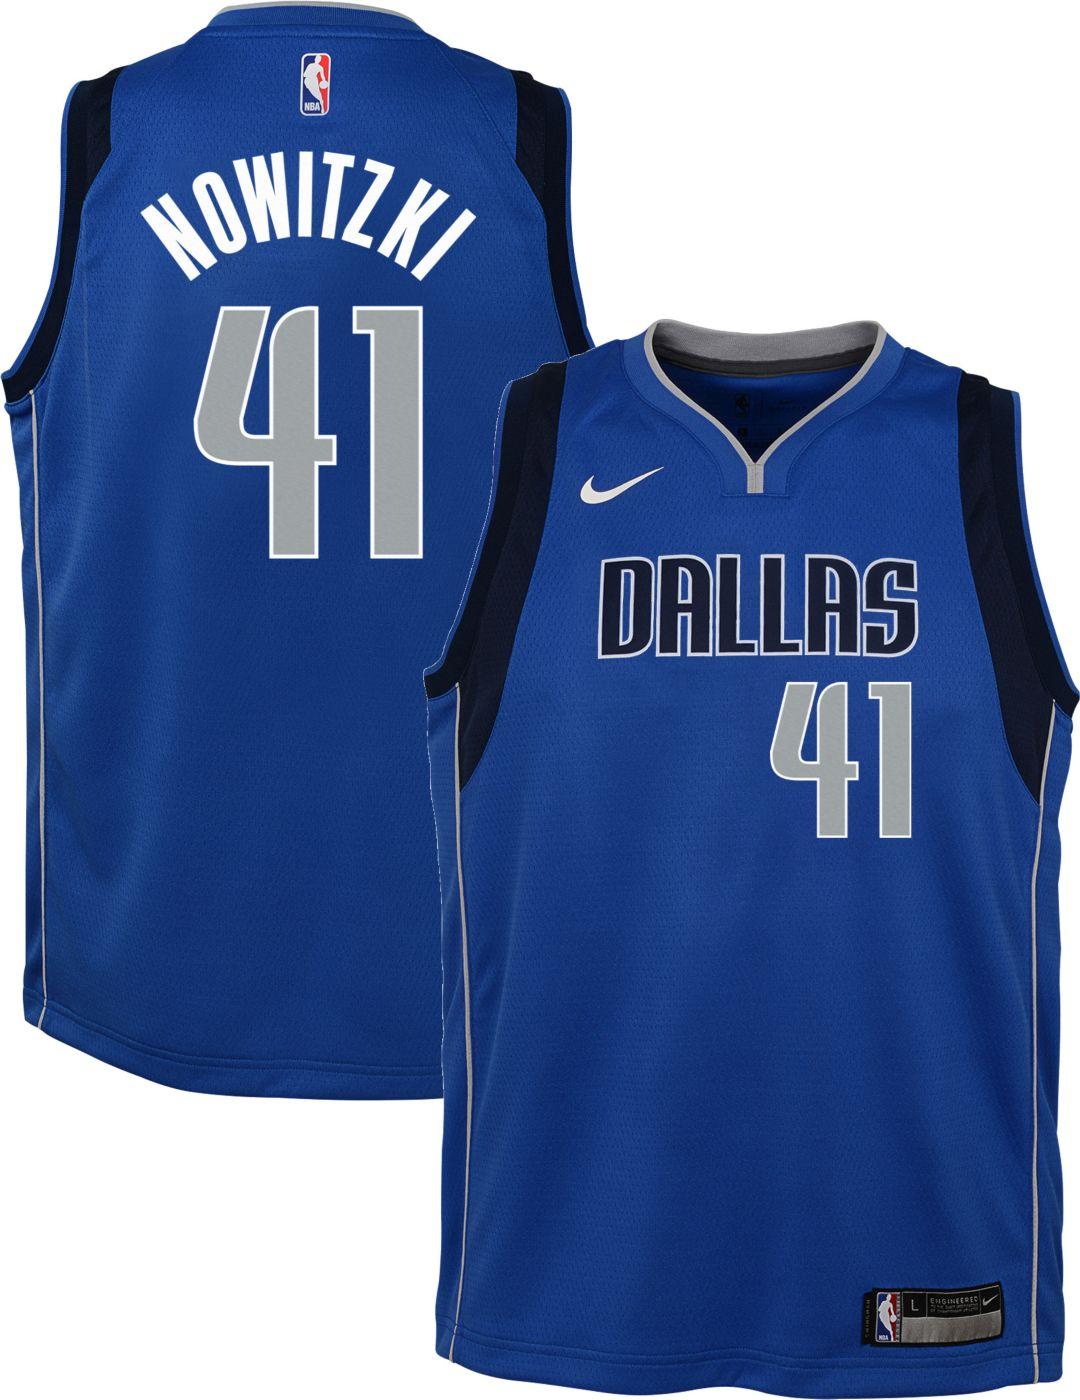 6470bece Nike Youth Dallas Mavericks Dirk Nowitzki #41 Royal Dri-FIT Swingman Jersey.  noImageFound. Previous